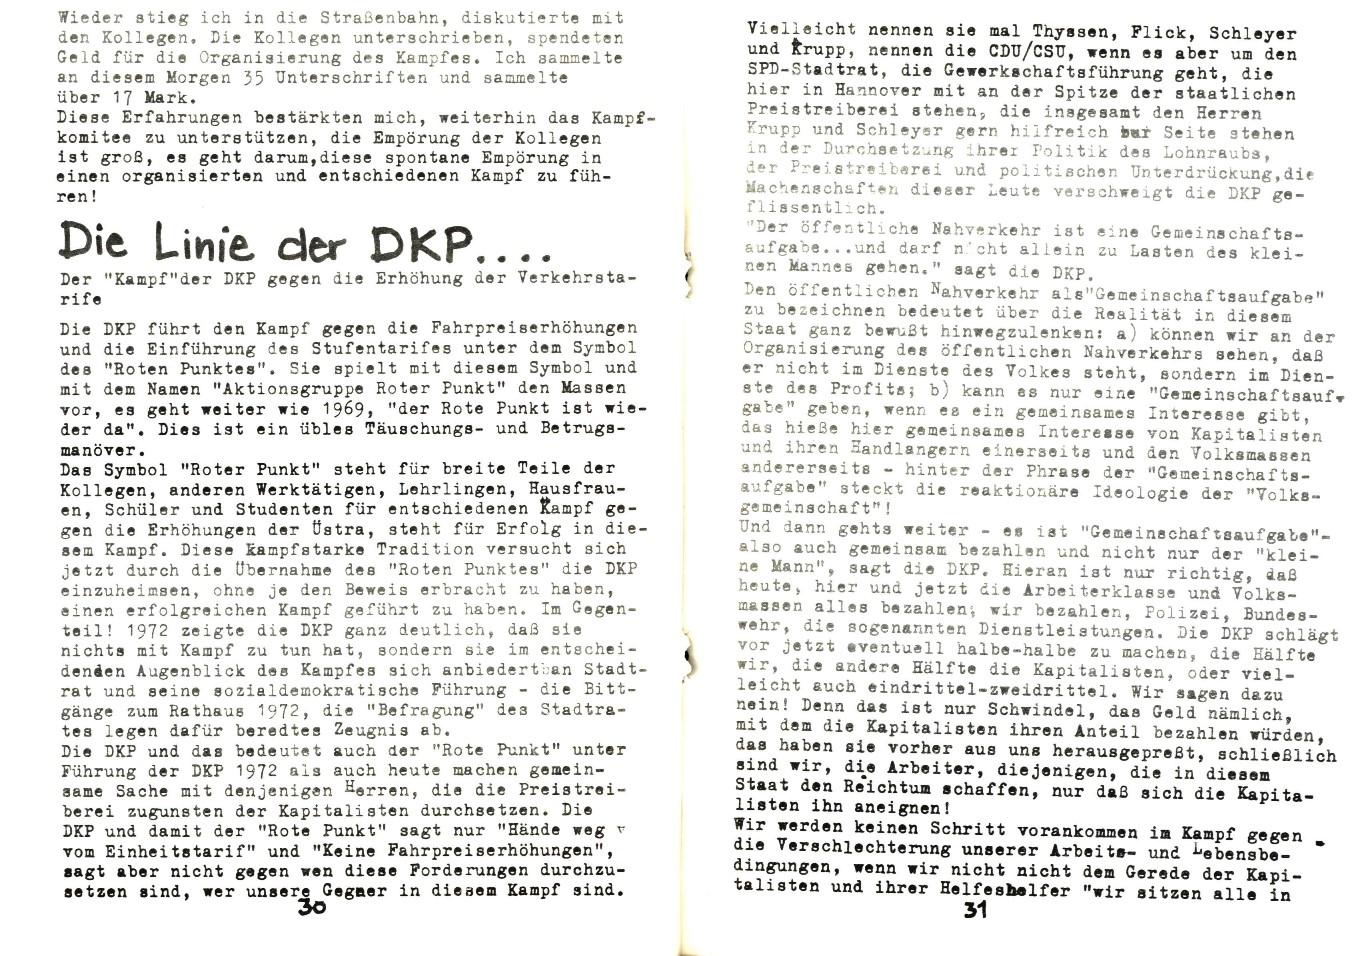 Hannover_AO_1975_Fahrpreisboykott_19